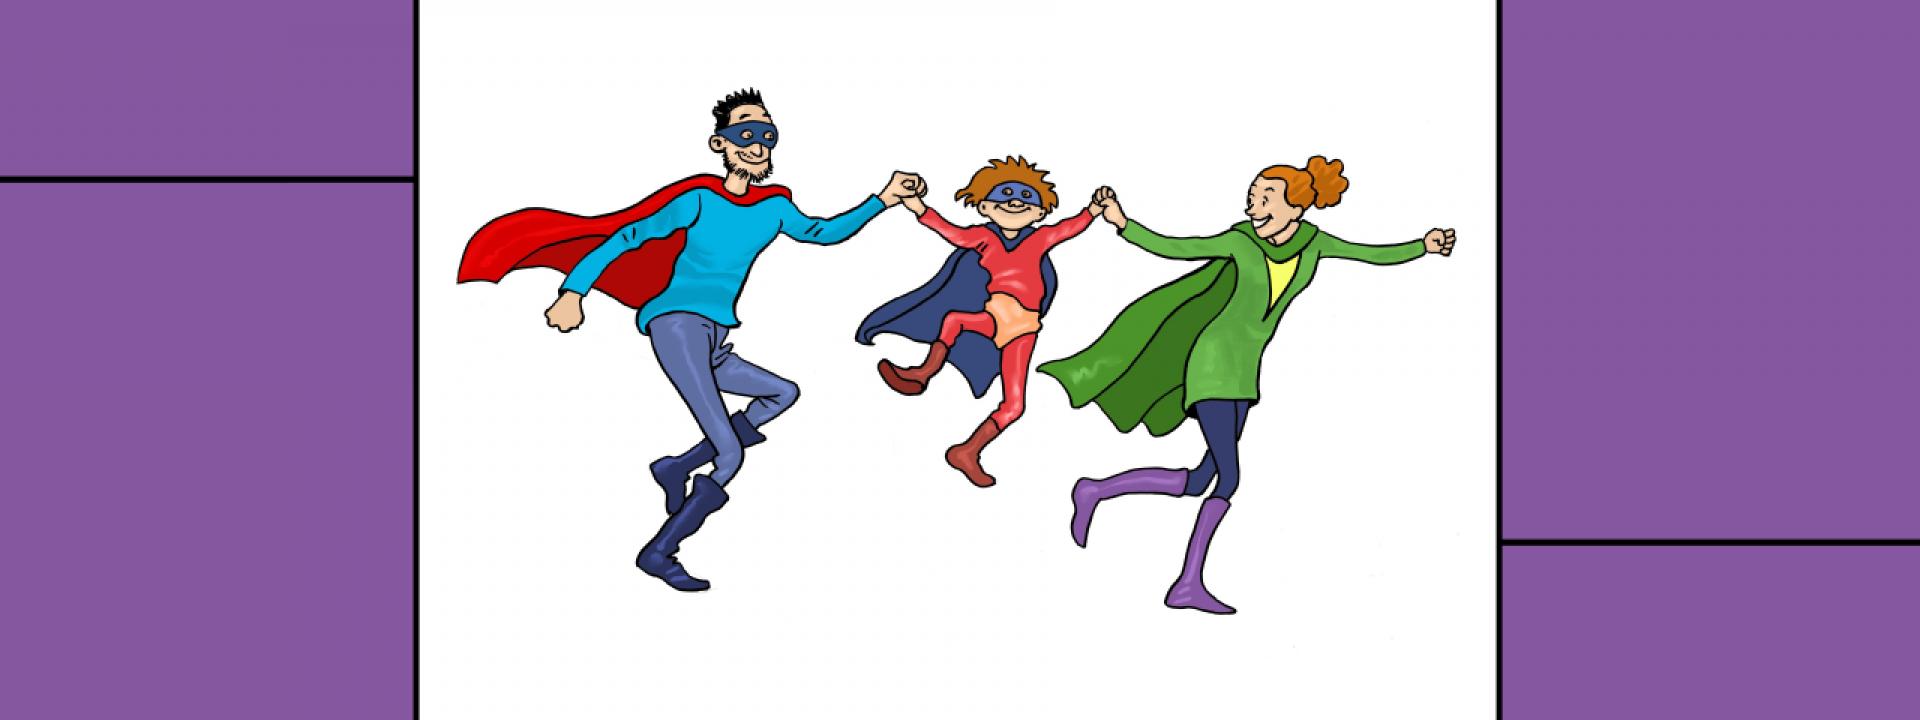 Comic: All weather heroes - June - Εικόνα